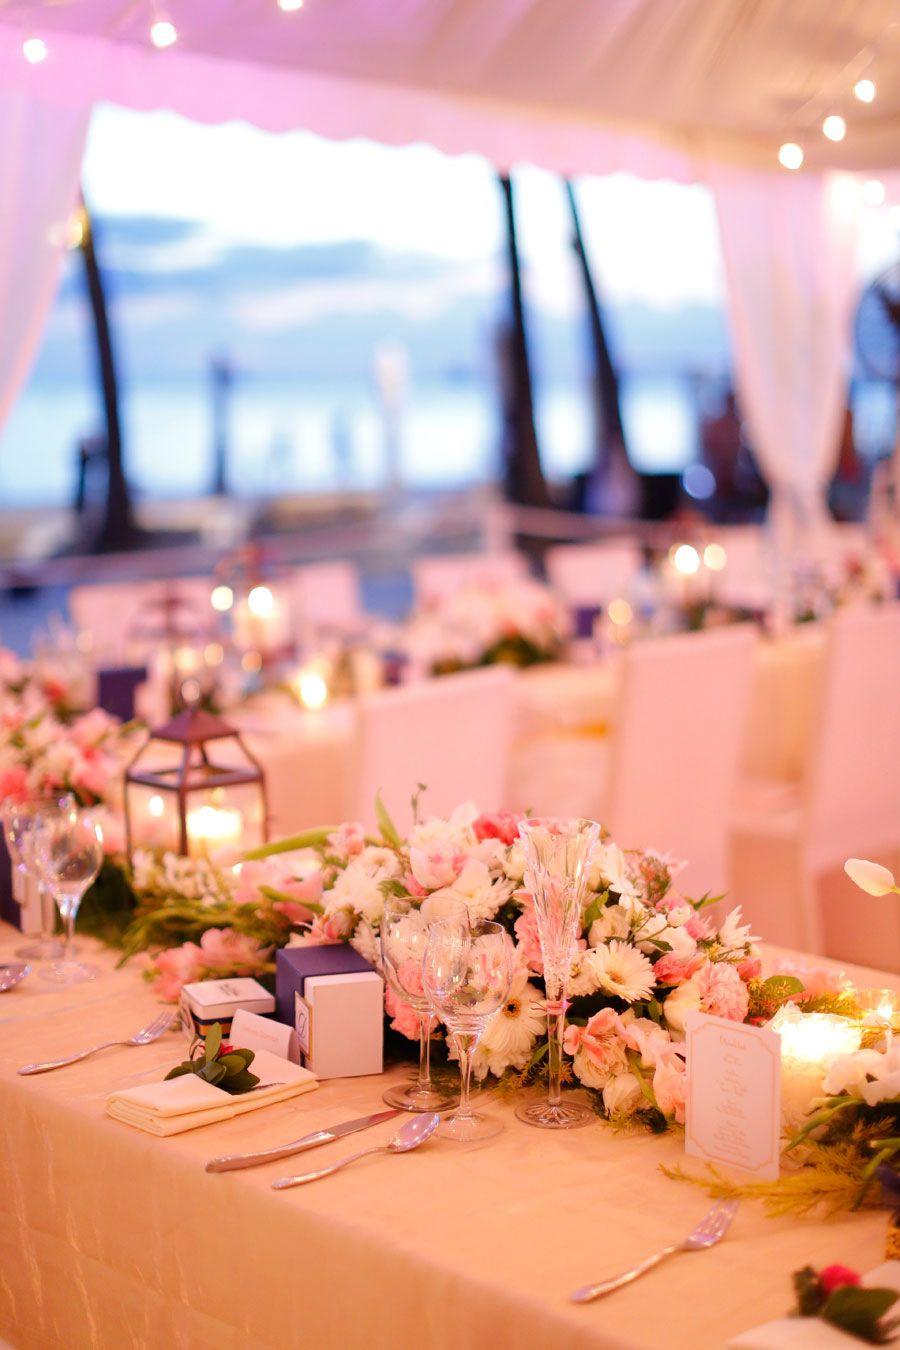 Tyson And Dees Romantic Beach Wedding At Discovery Shores Boracay